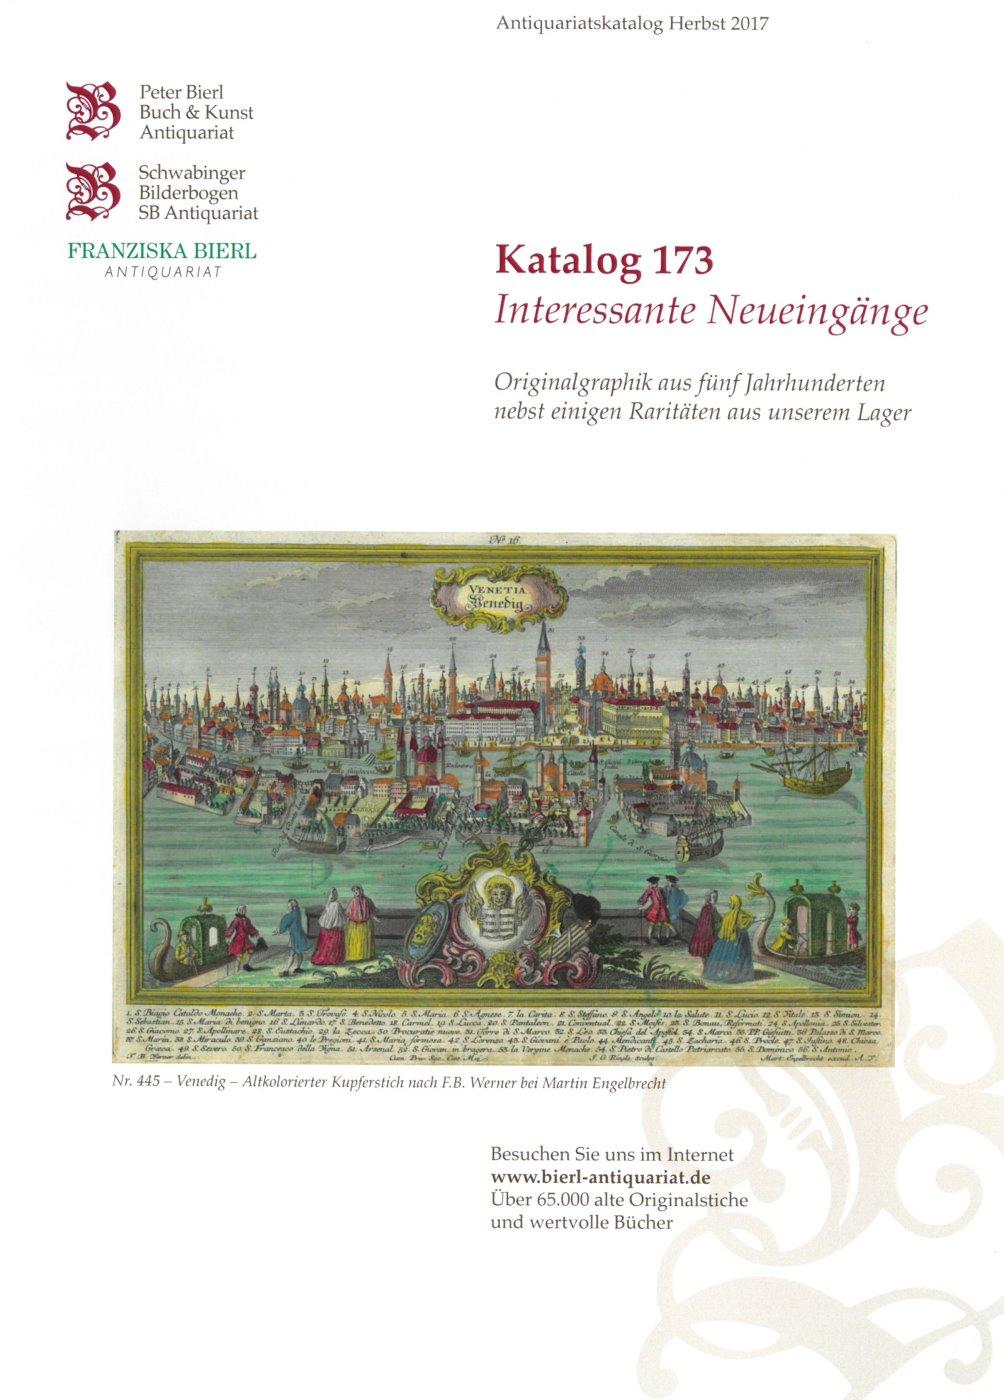 Katalog 173 - Interessante Neueingänge